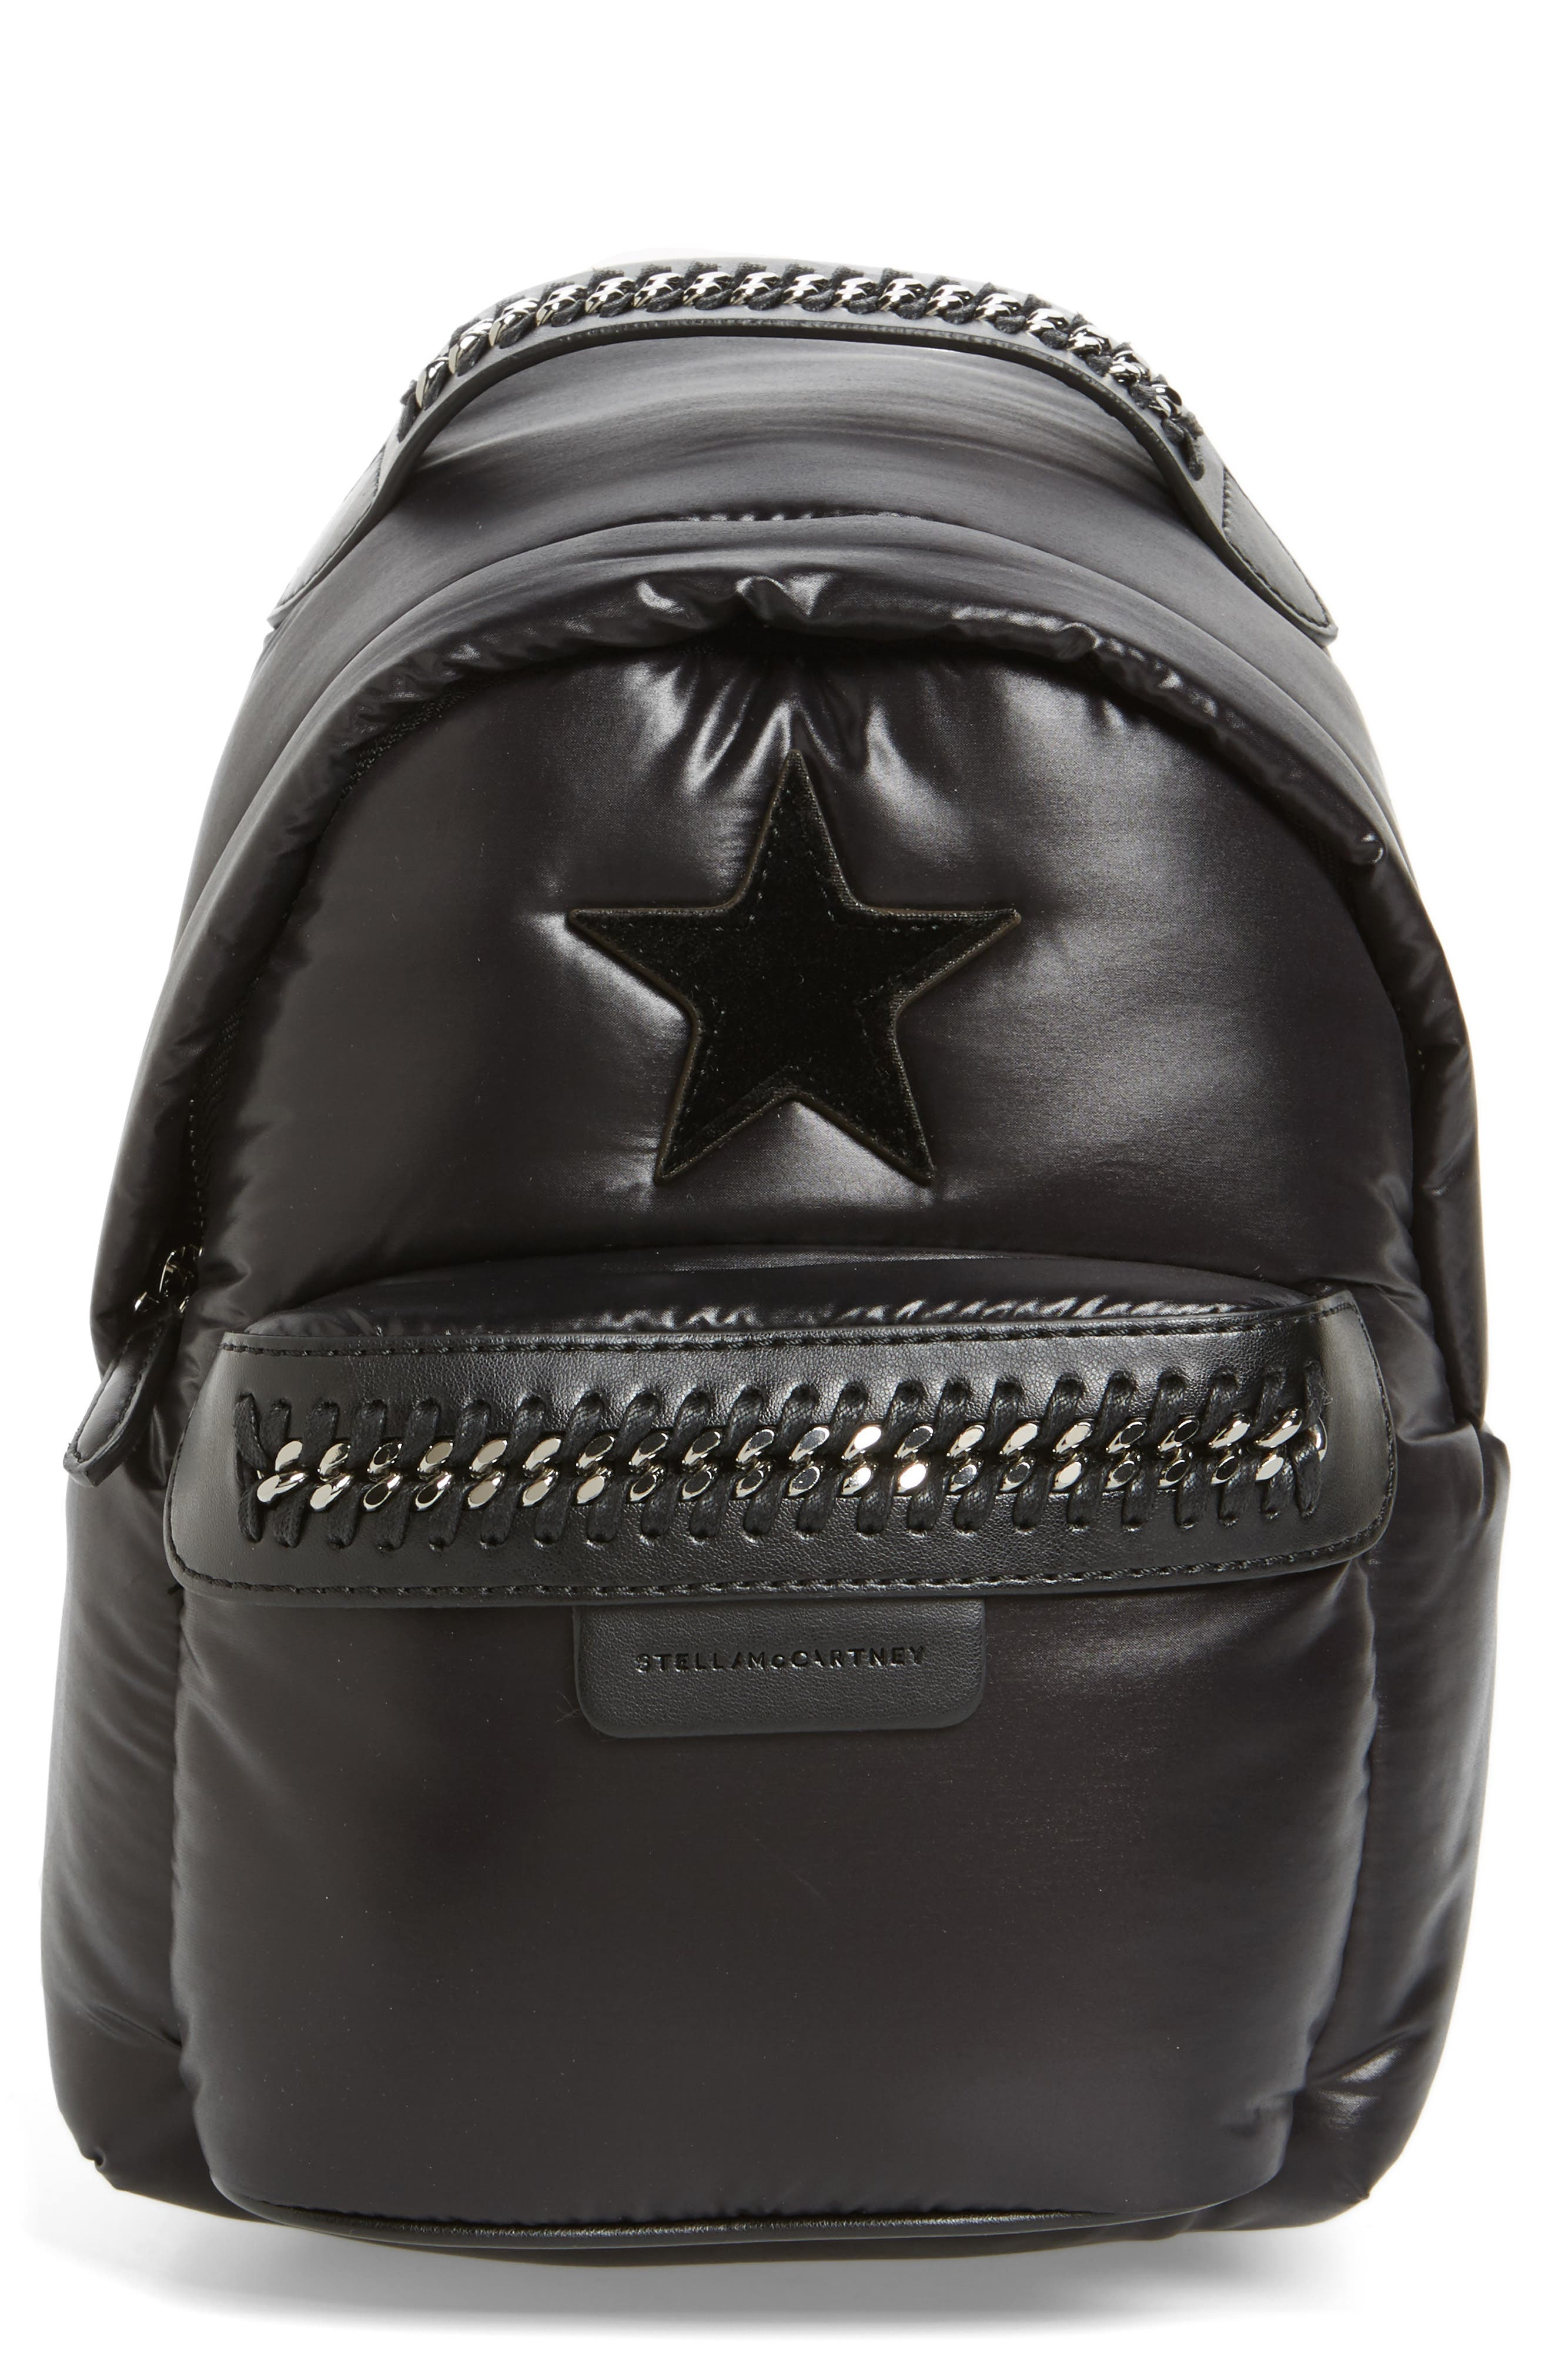 Mini Falabella Go Star Backpack,                             Main thumbnail 1, color,                             001